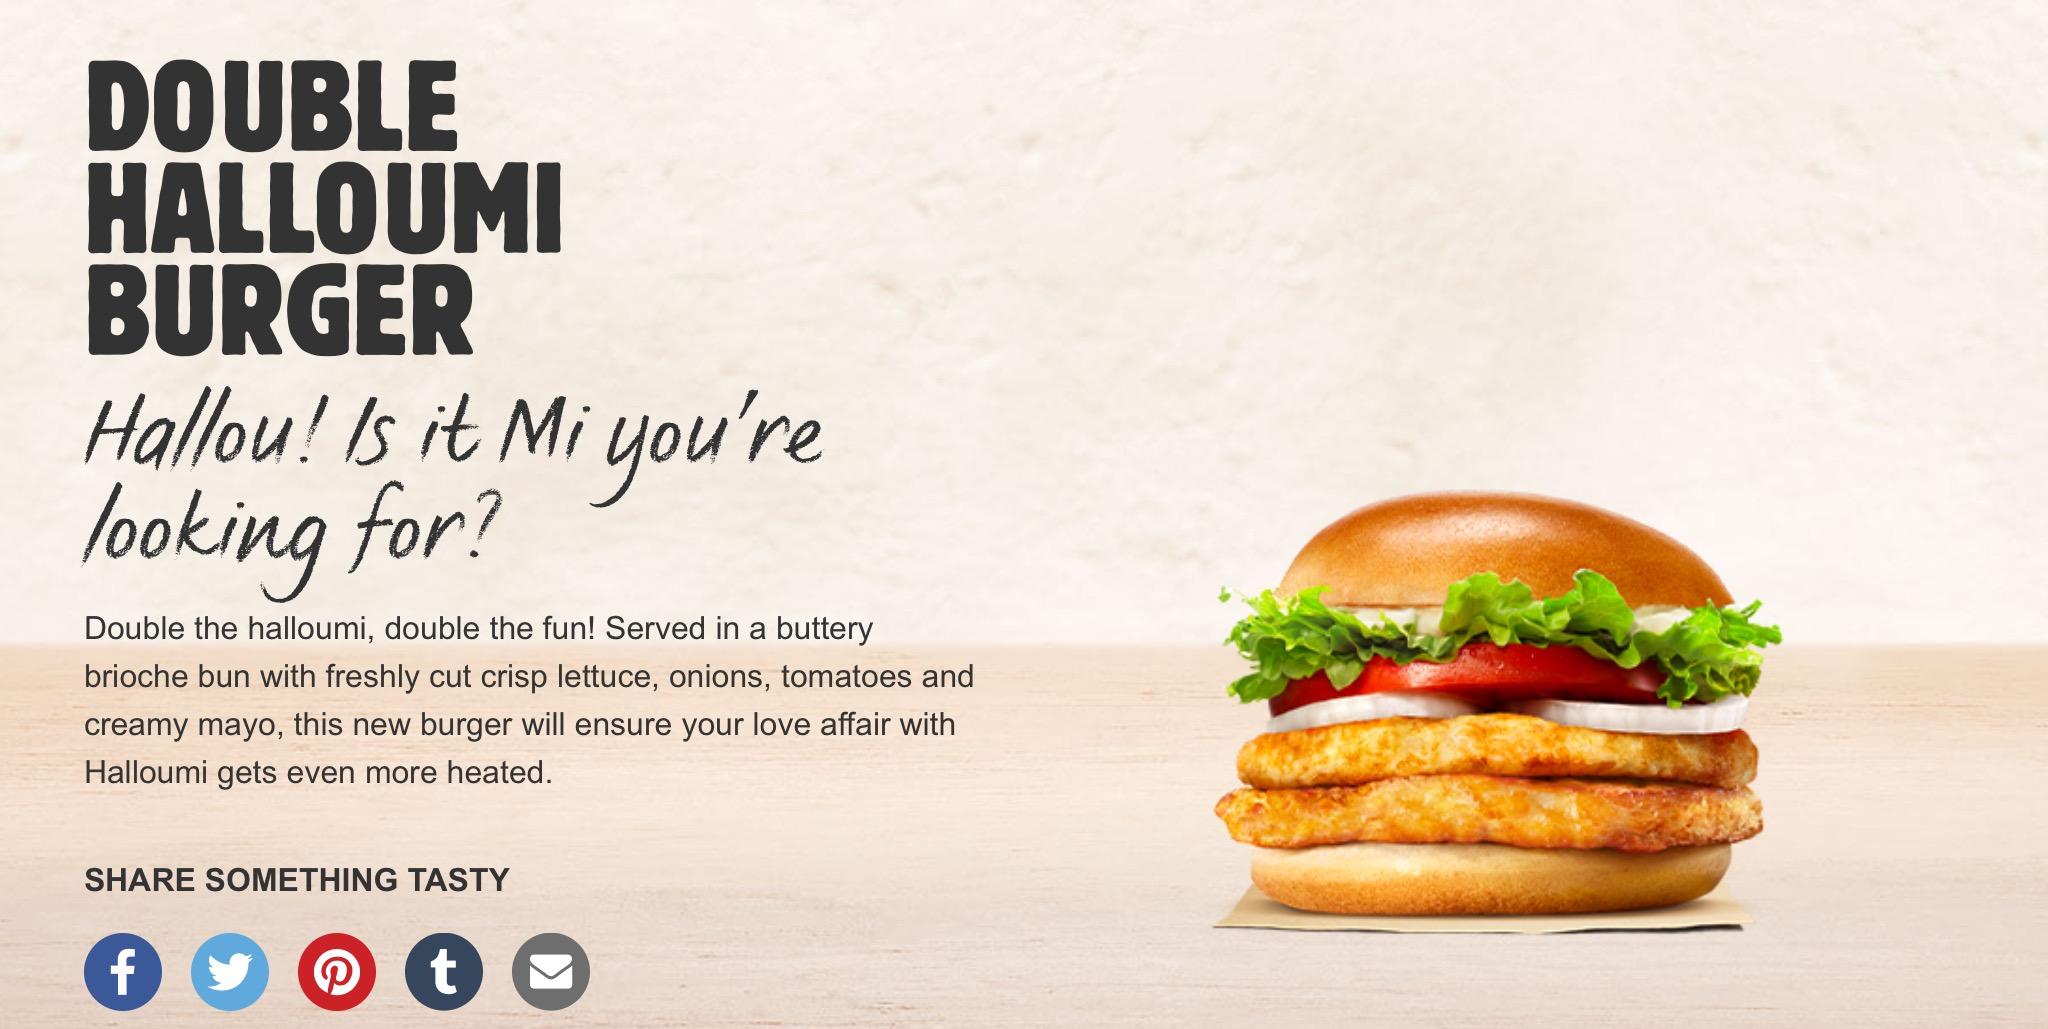 Double Halloumi Burger